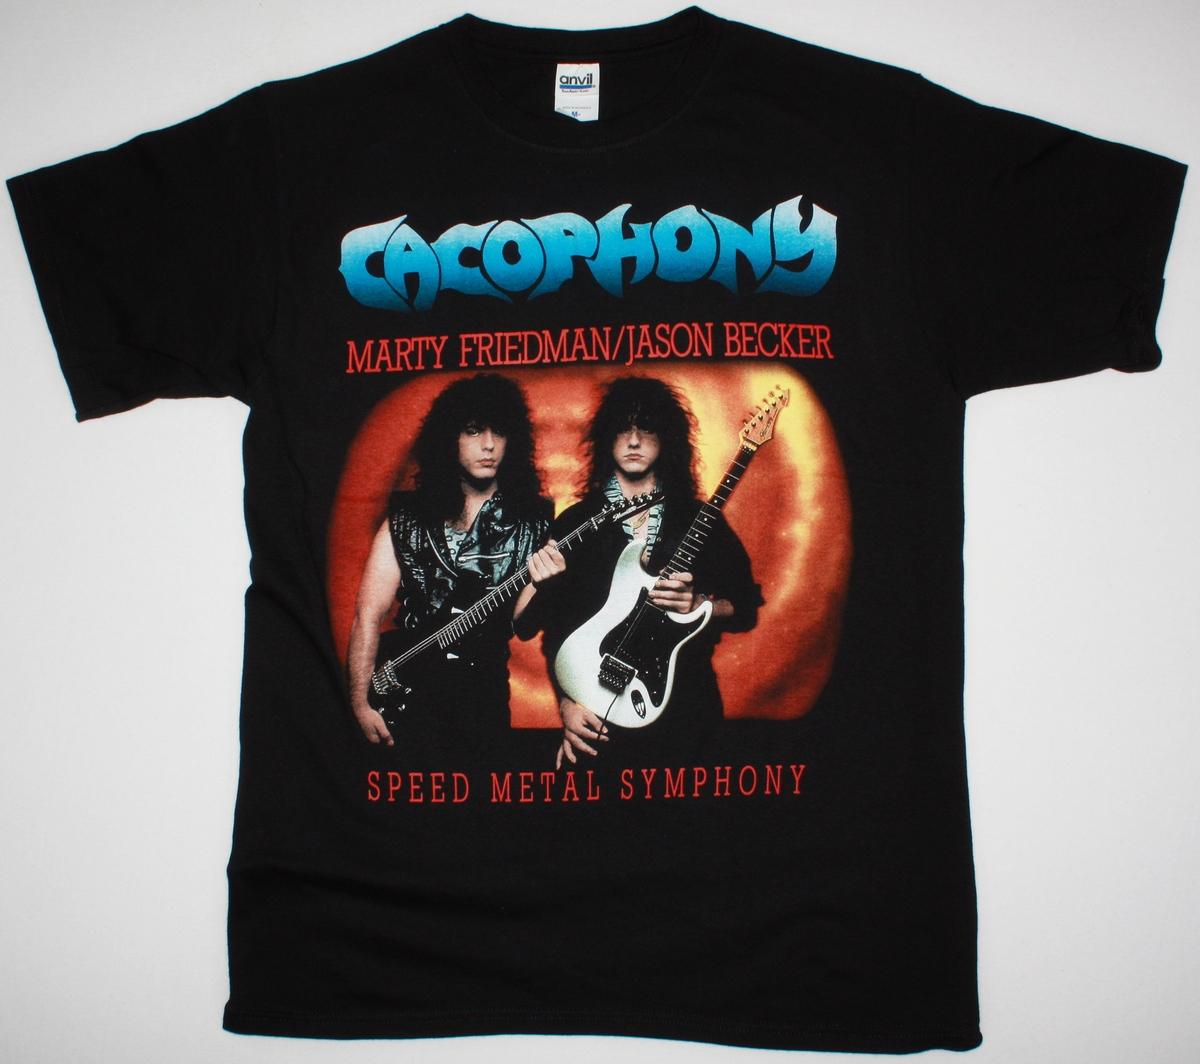 Cacophony Speed Metal Symphony Marty Friedman Jason Becker